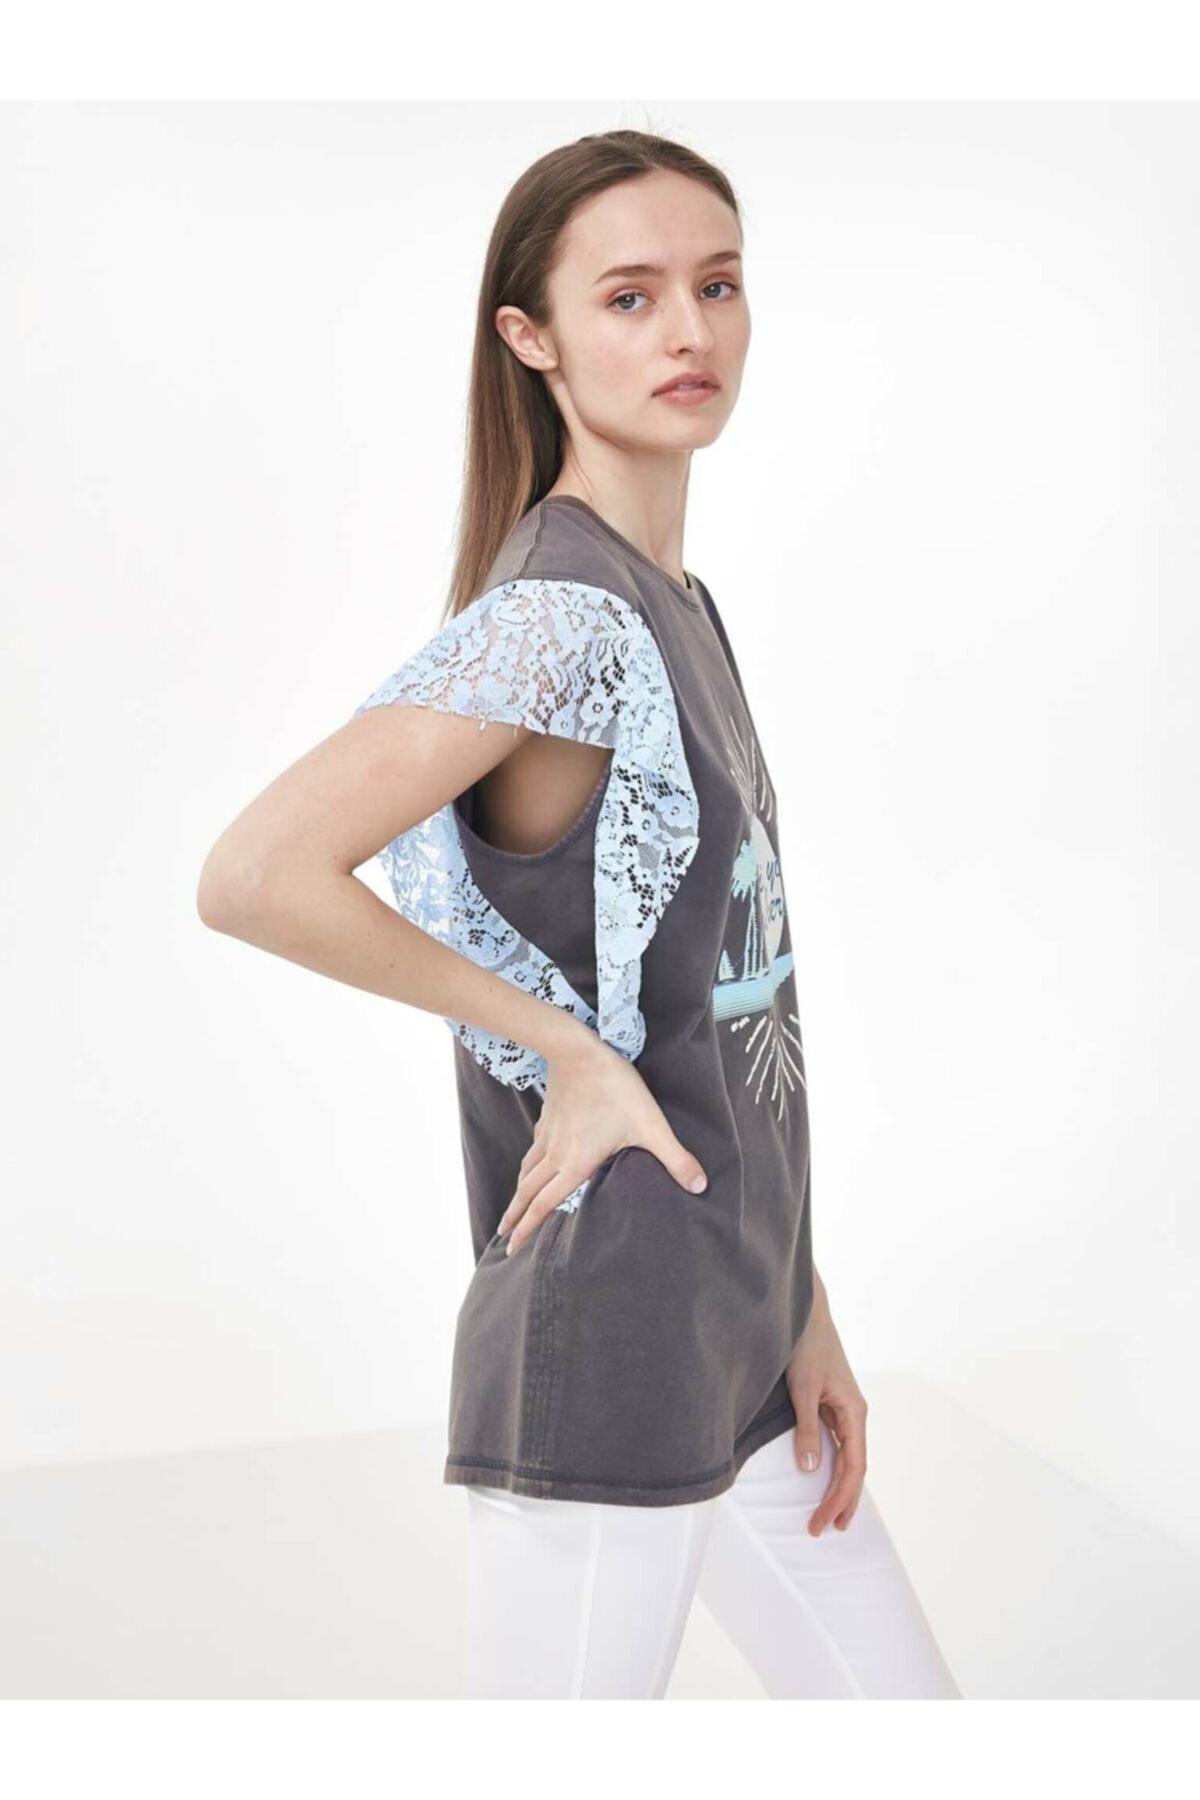 Twist Kadın Gri Dantel Mixli Tshirt TS1200070160126 1